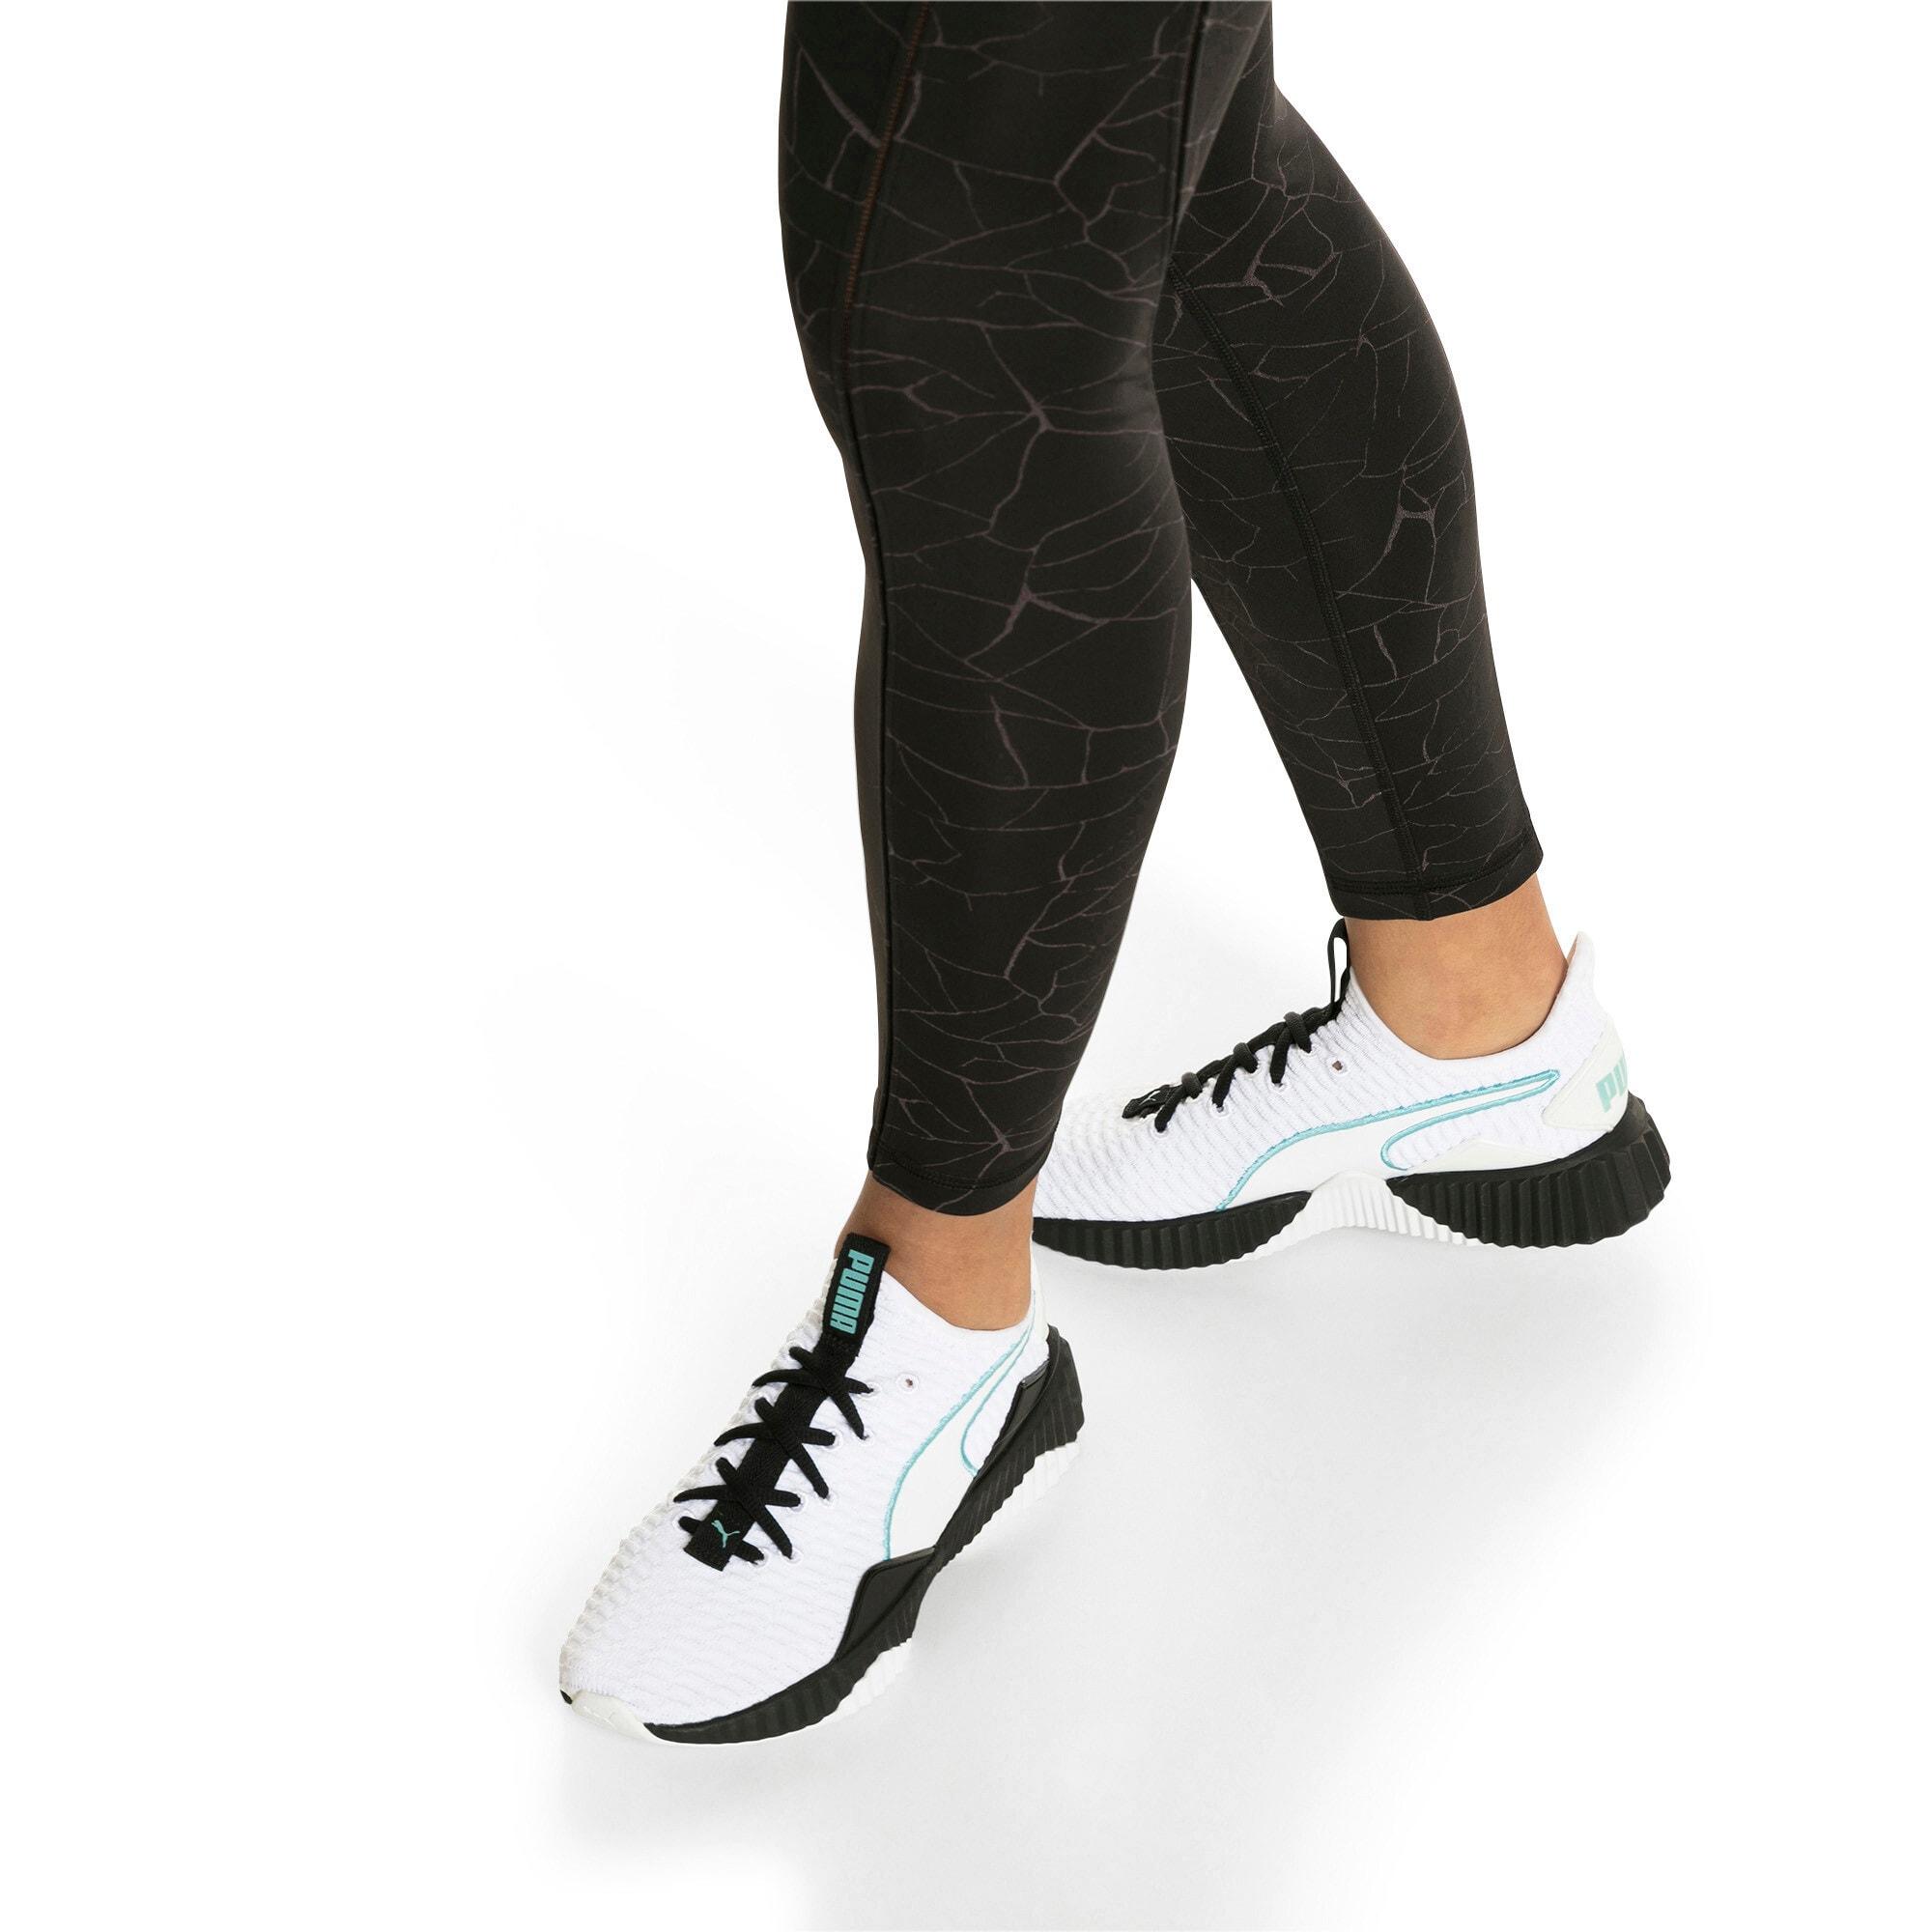 Thumbnail 8 of Defy Damen Sneaker, Puma White-Puma Black, medium